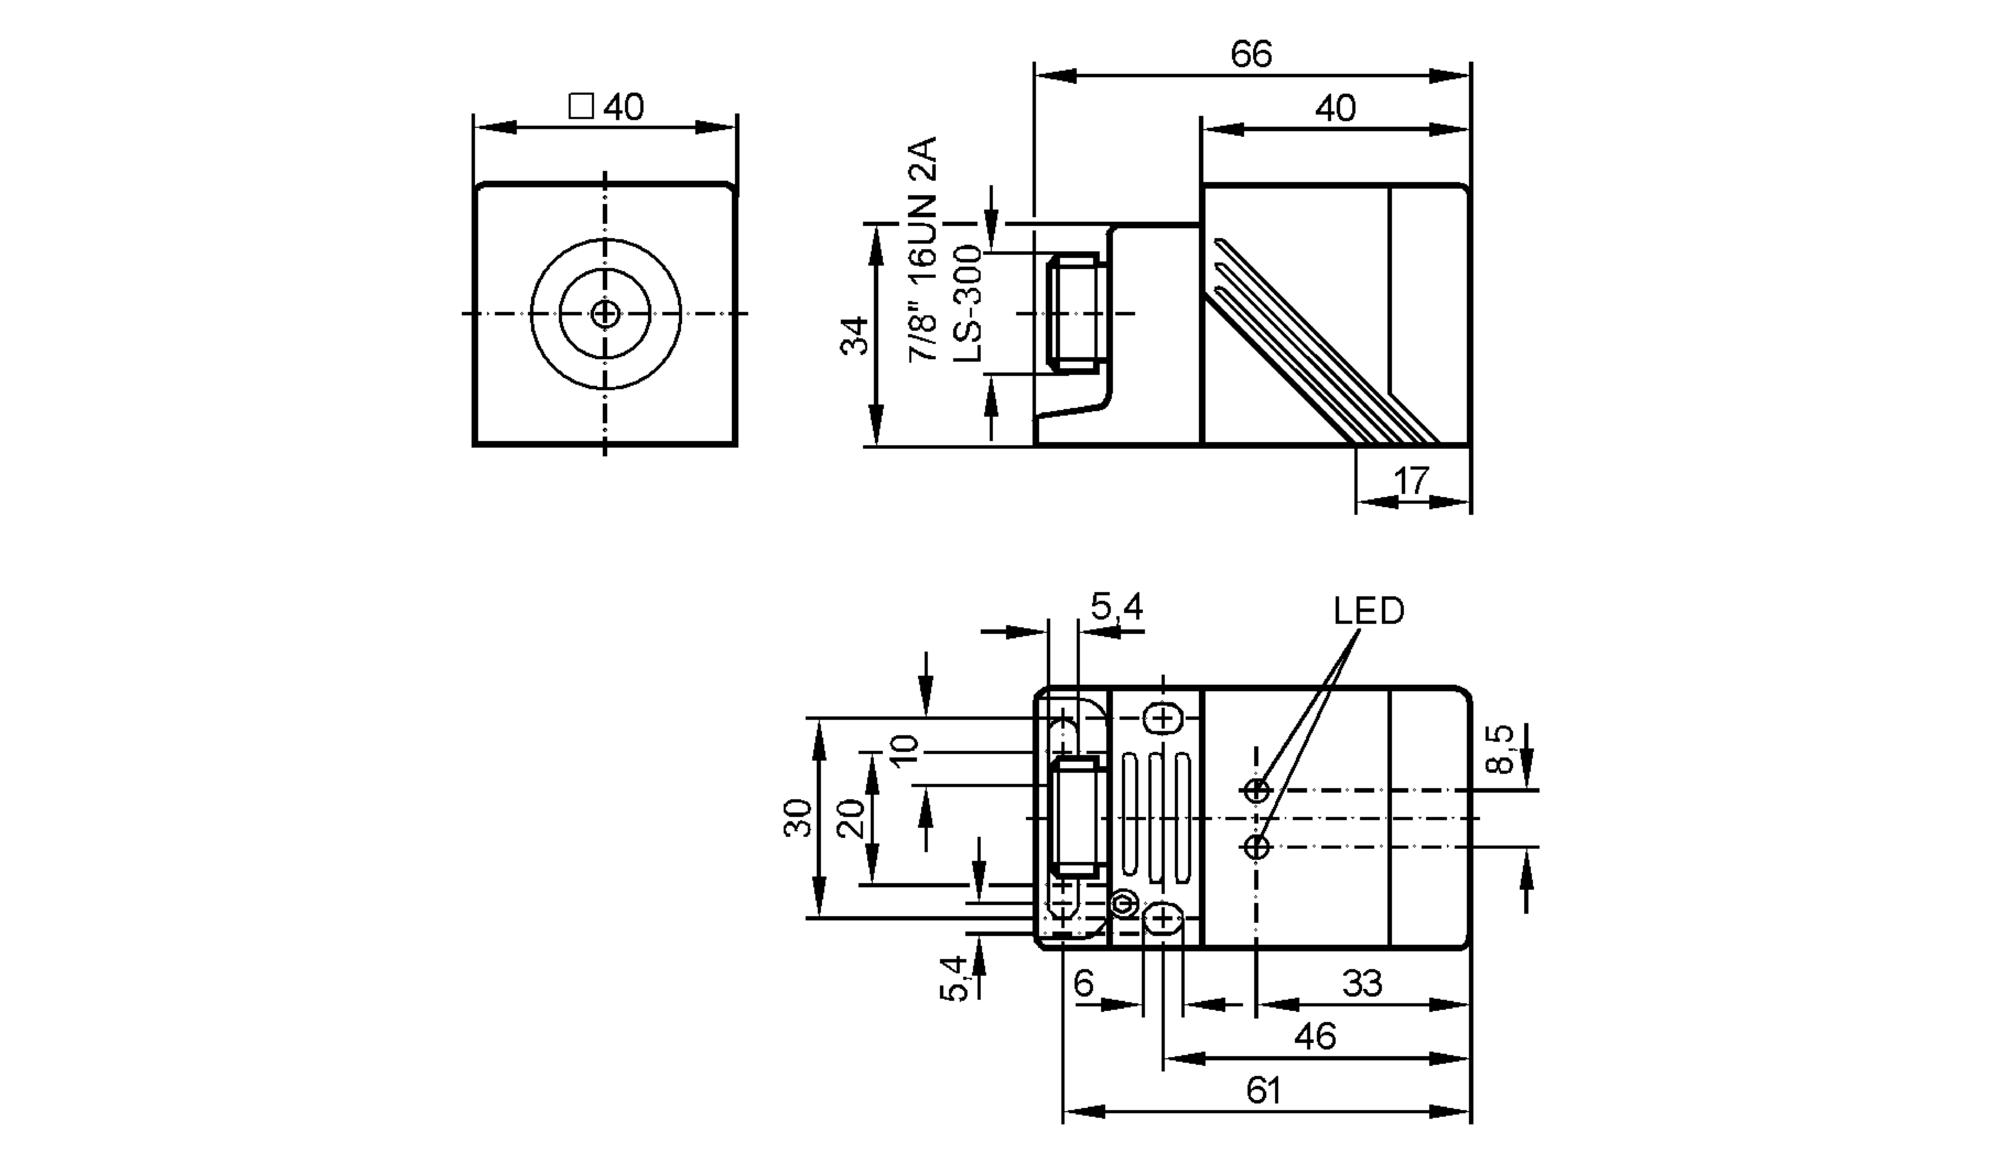 hight resolution of im0042 inductive sensor ifm electronic 3 wire sensor diagram ifm proximity sensor wiring diagram